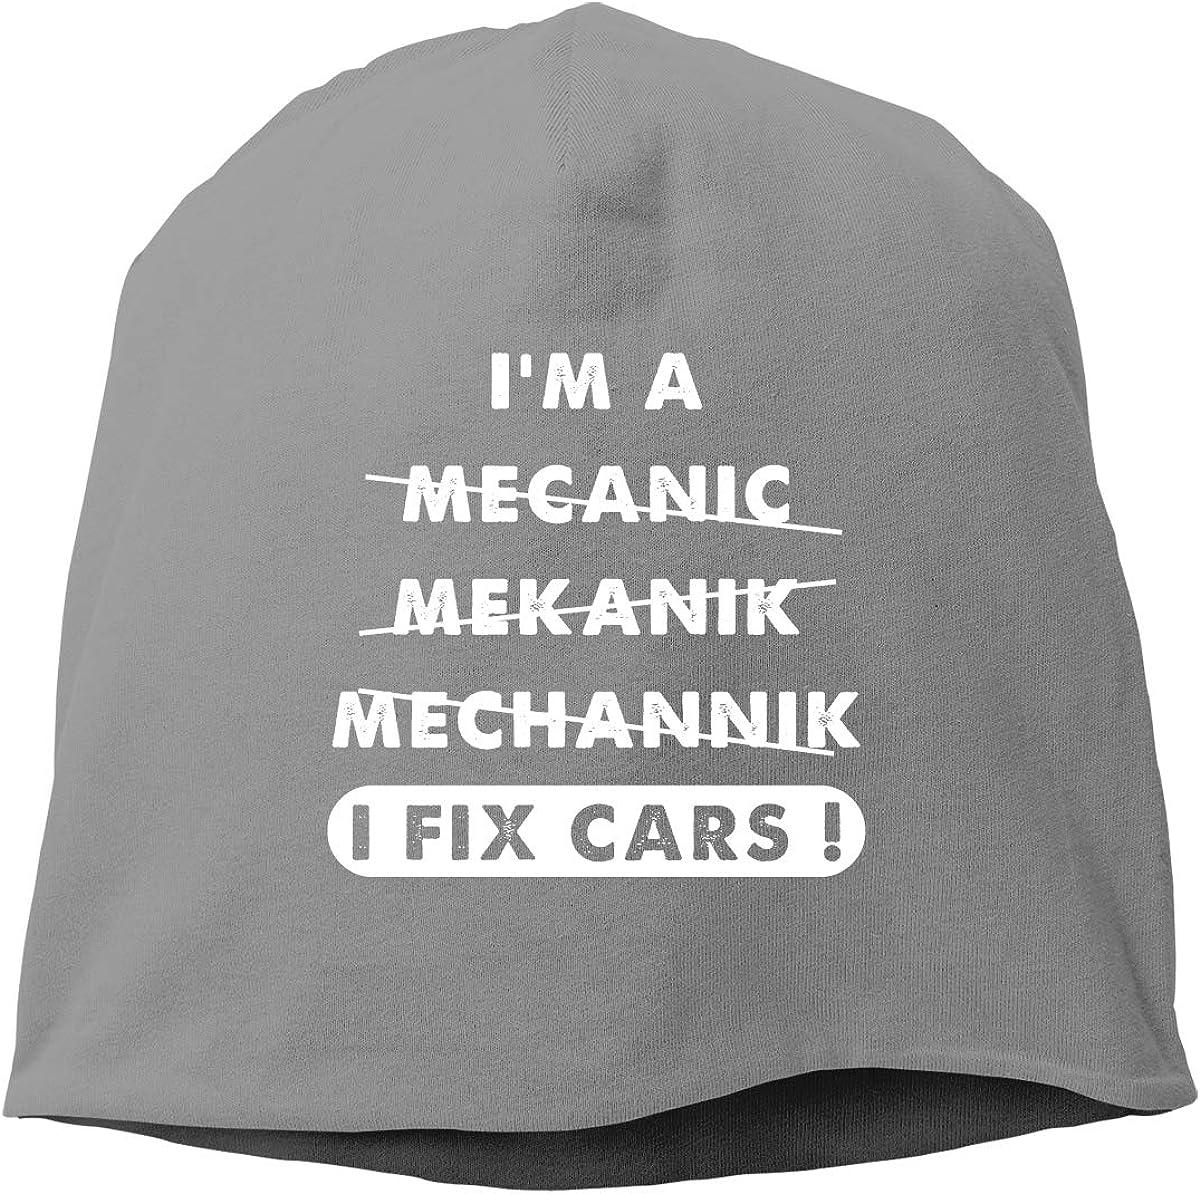 Im A Mechanic I Fix Cars Unisex Knitted Hat Beanie Hat Warm Hats Skull Cap